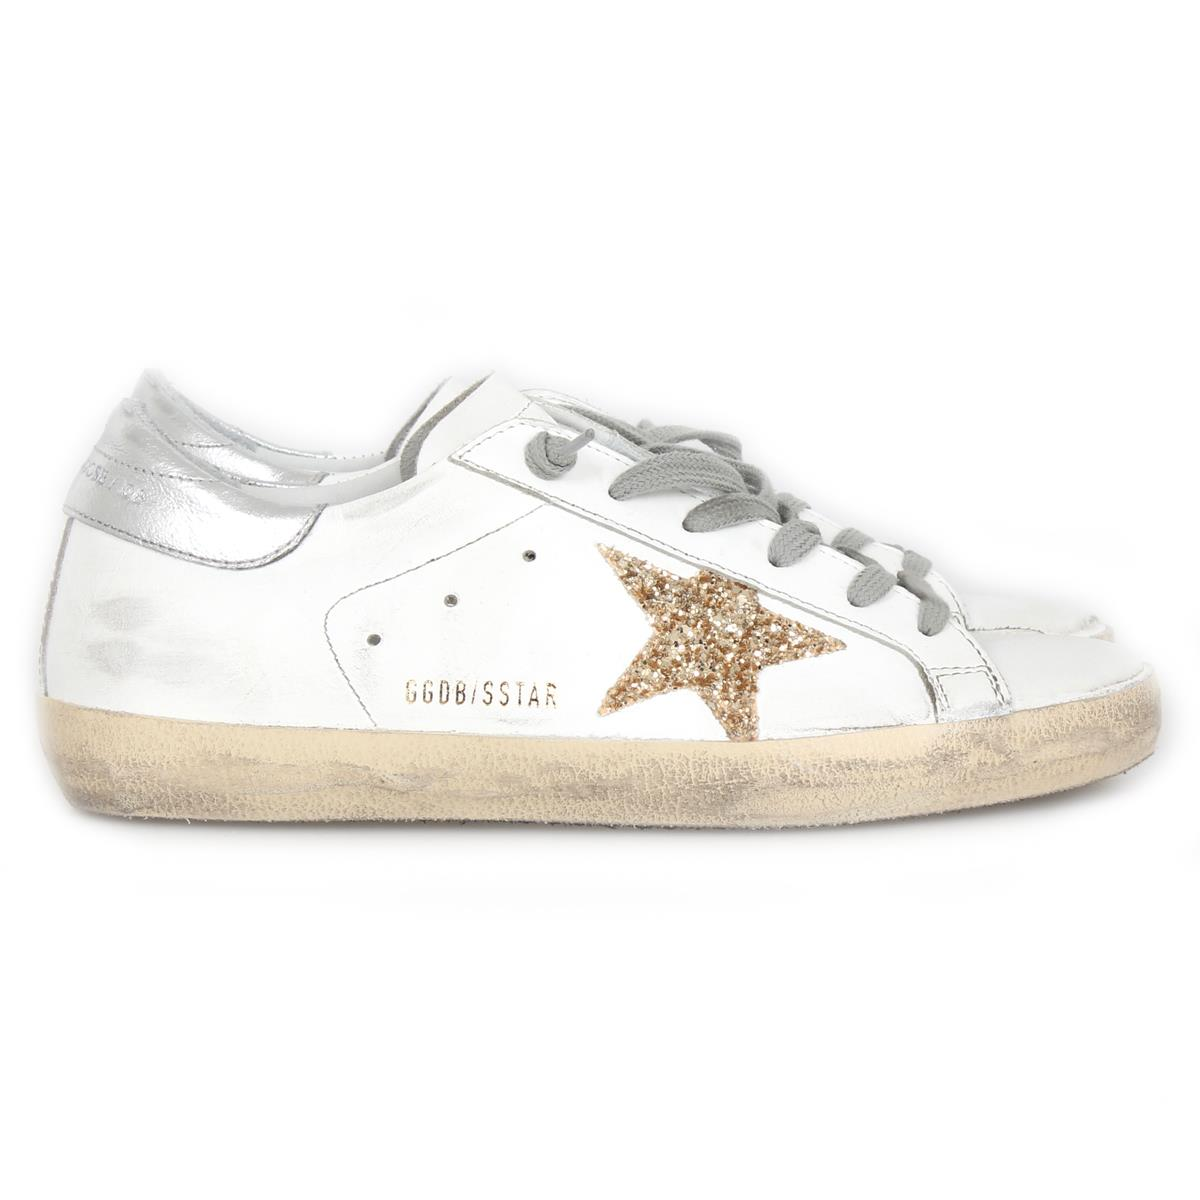 Oie D'or Chaussures De Sport D'oie D'or Superstar 36 38 39 zCgkZMg